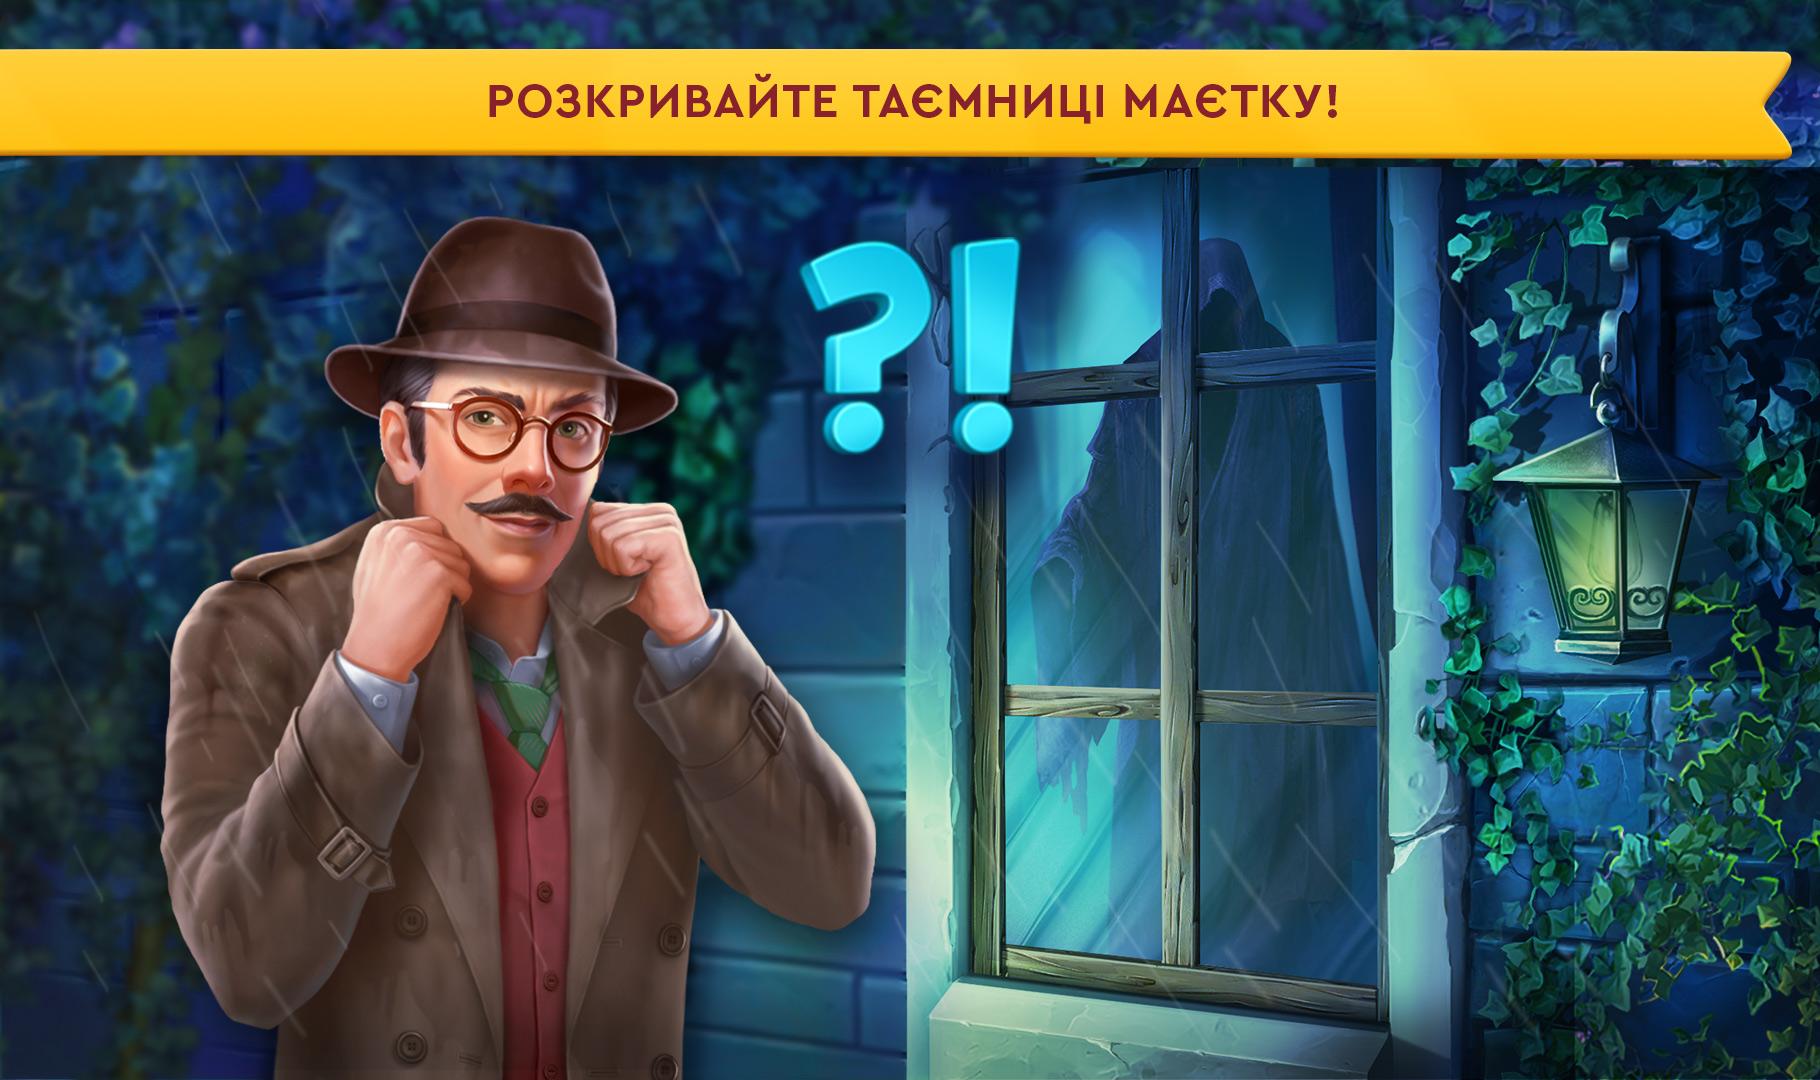 Post_3_ukr